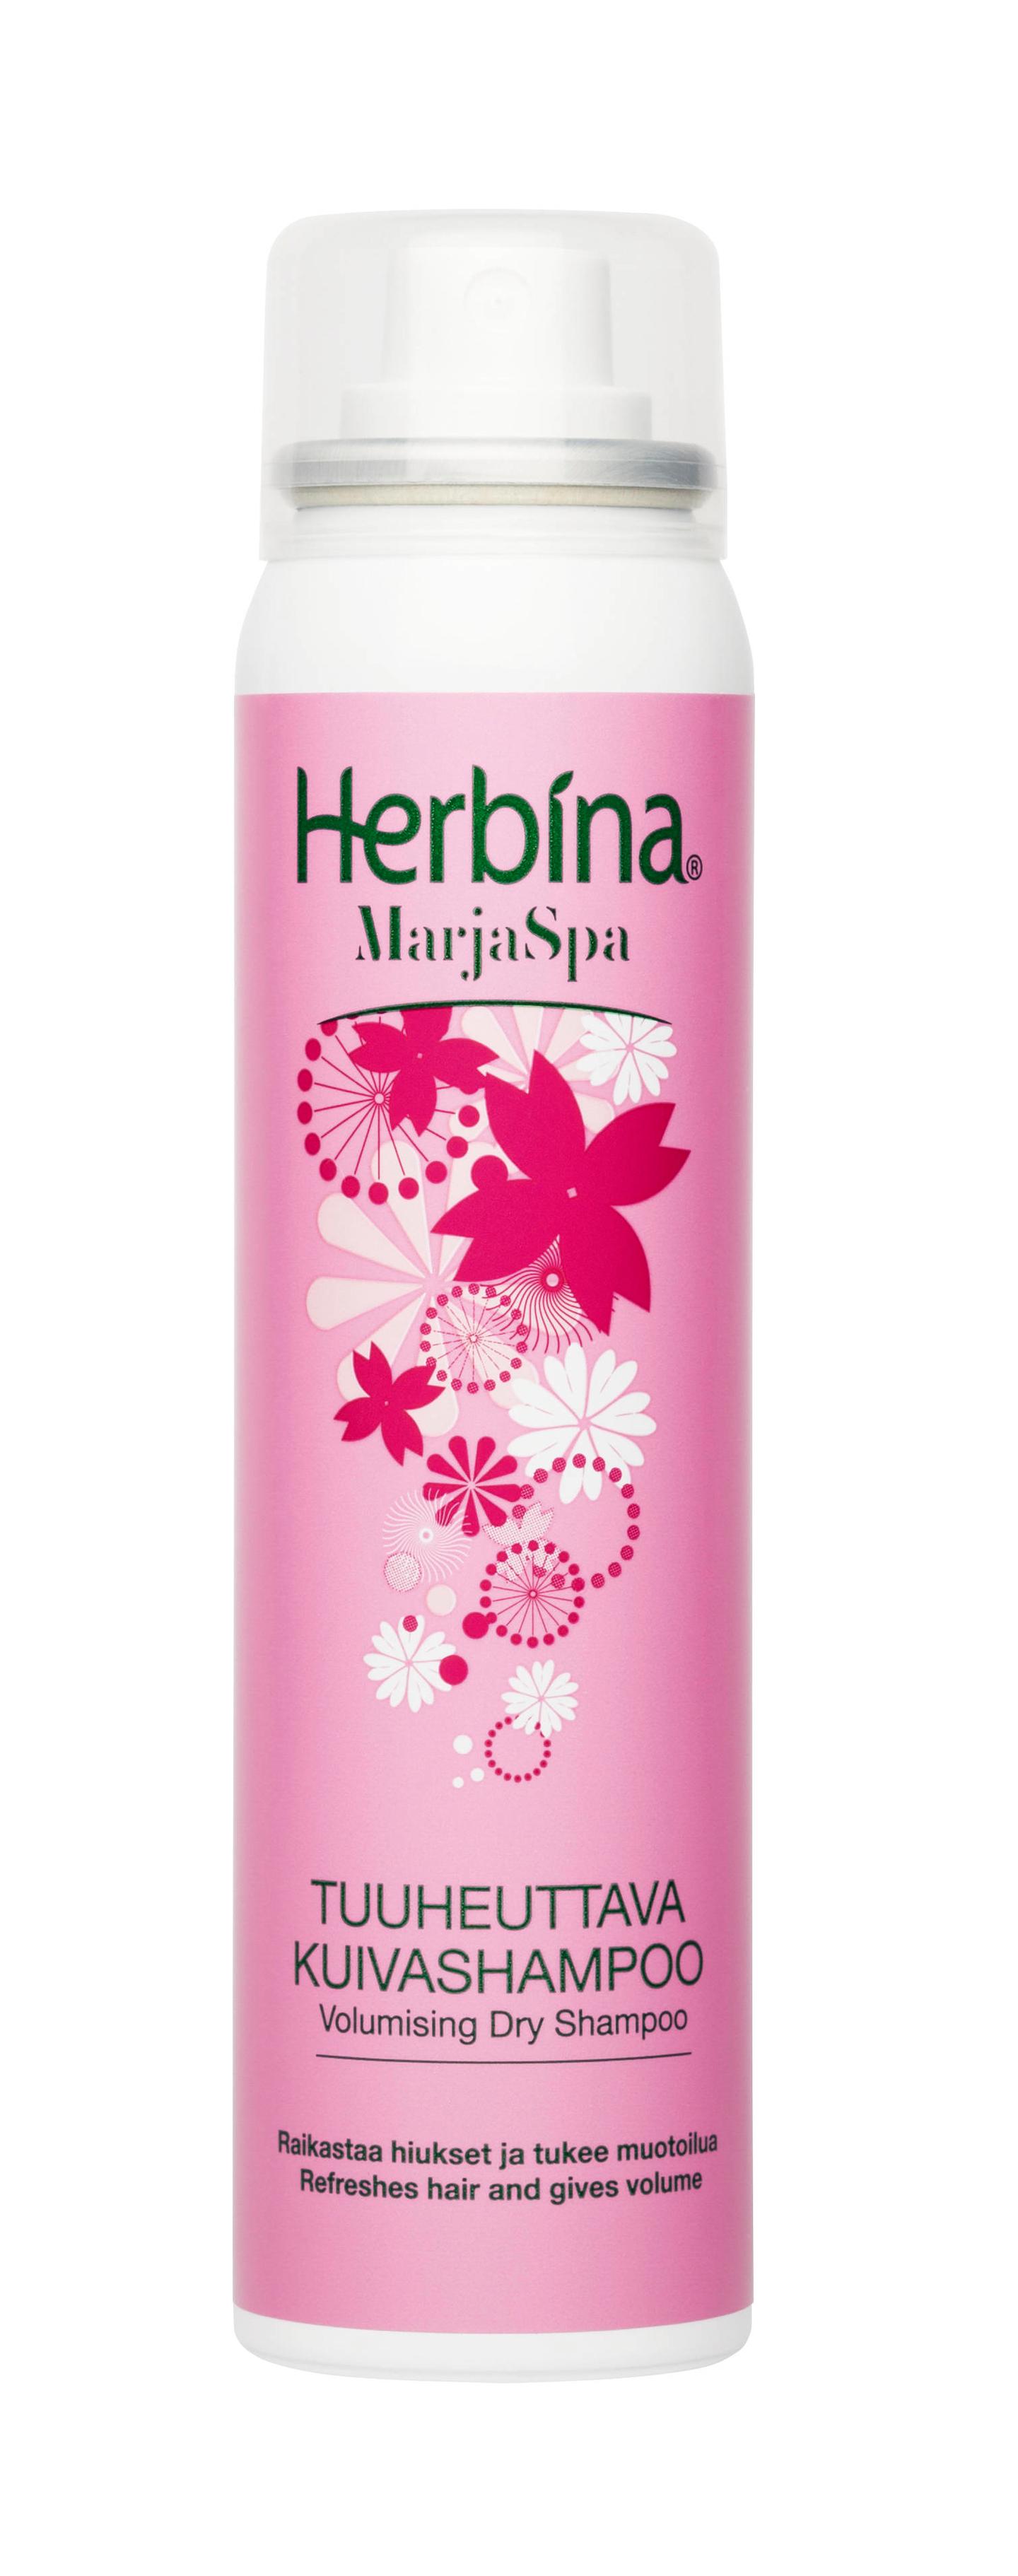 Herbina kuivashampoo 100ml marjaspa – K-Ruoka 6e067f9049